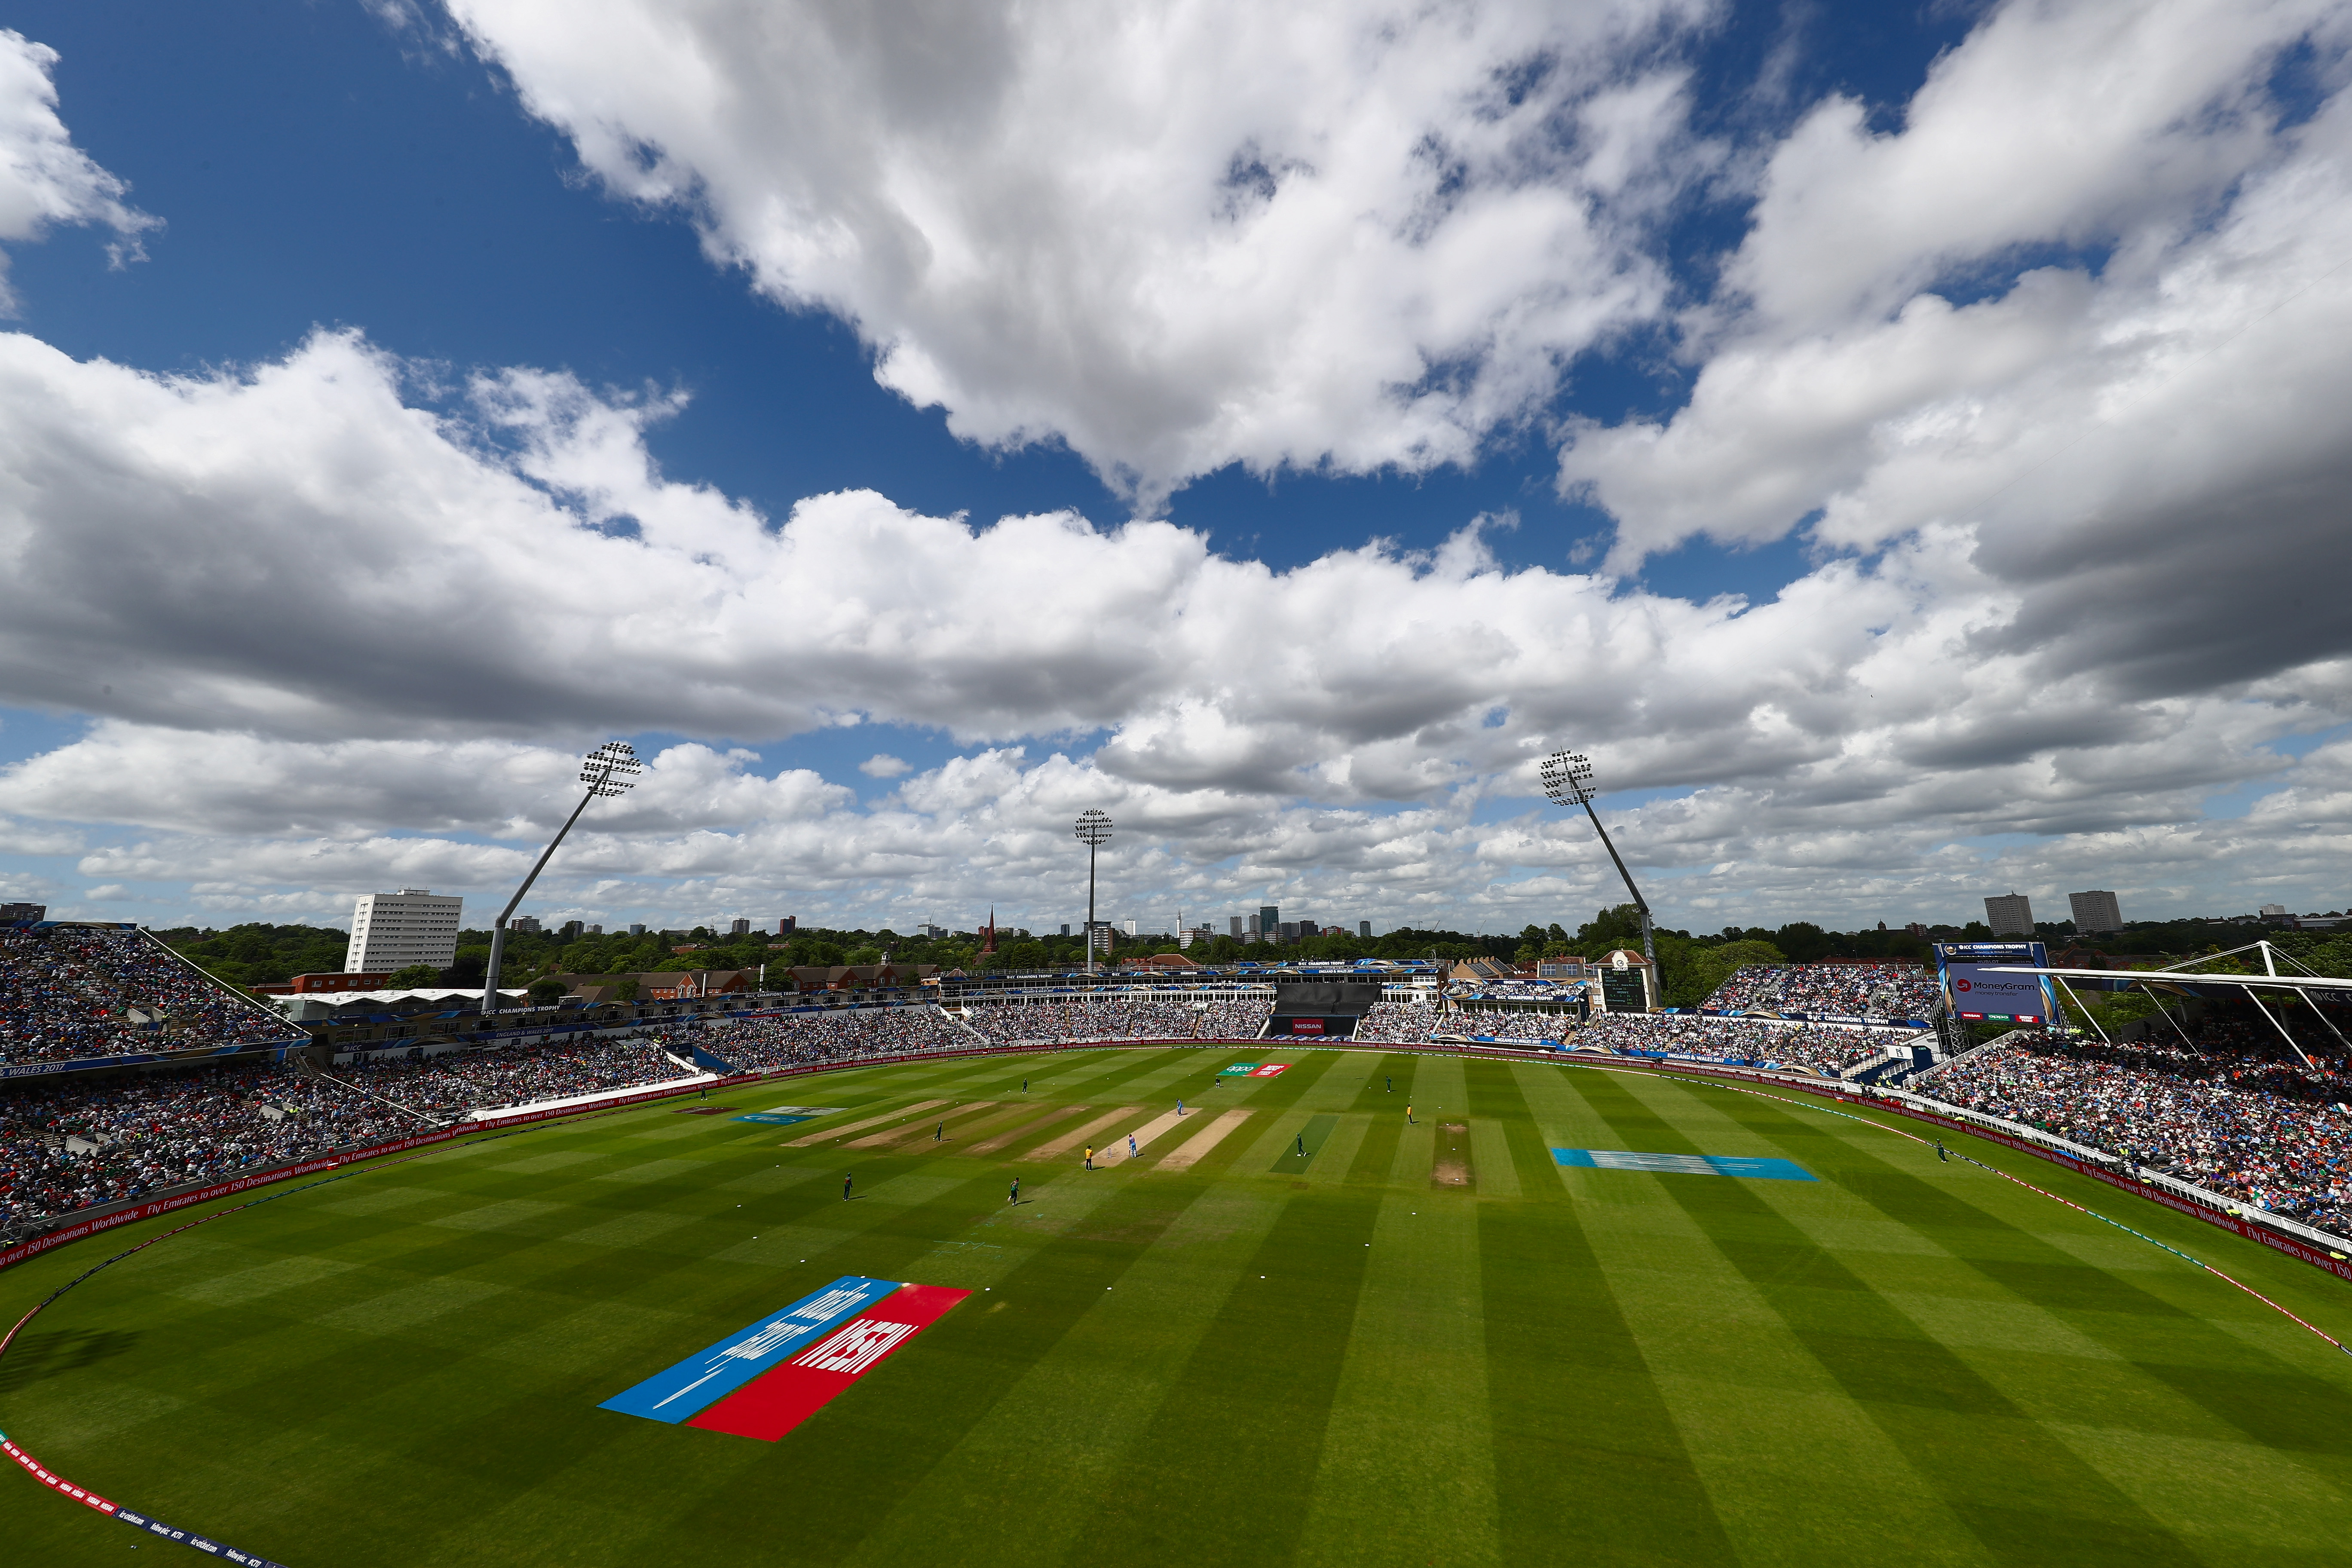 Edgbaston Cricket Ground | Cricket World Cup 2019